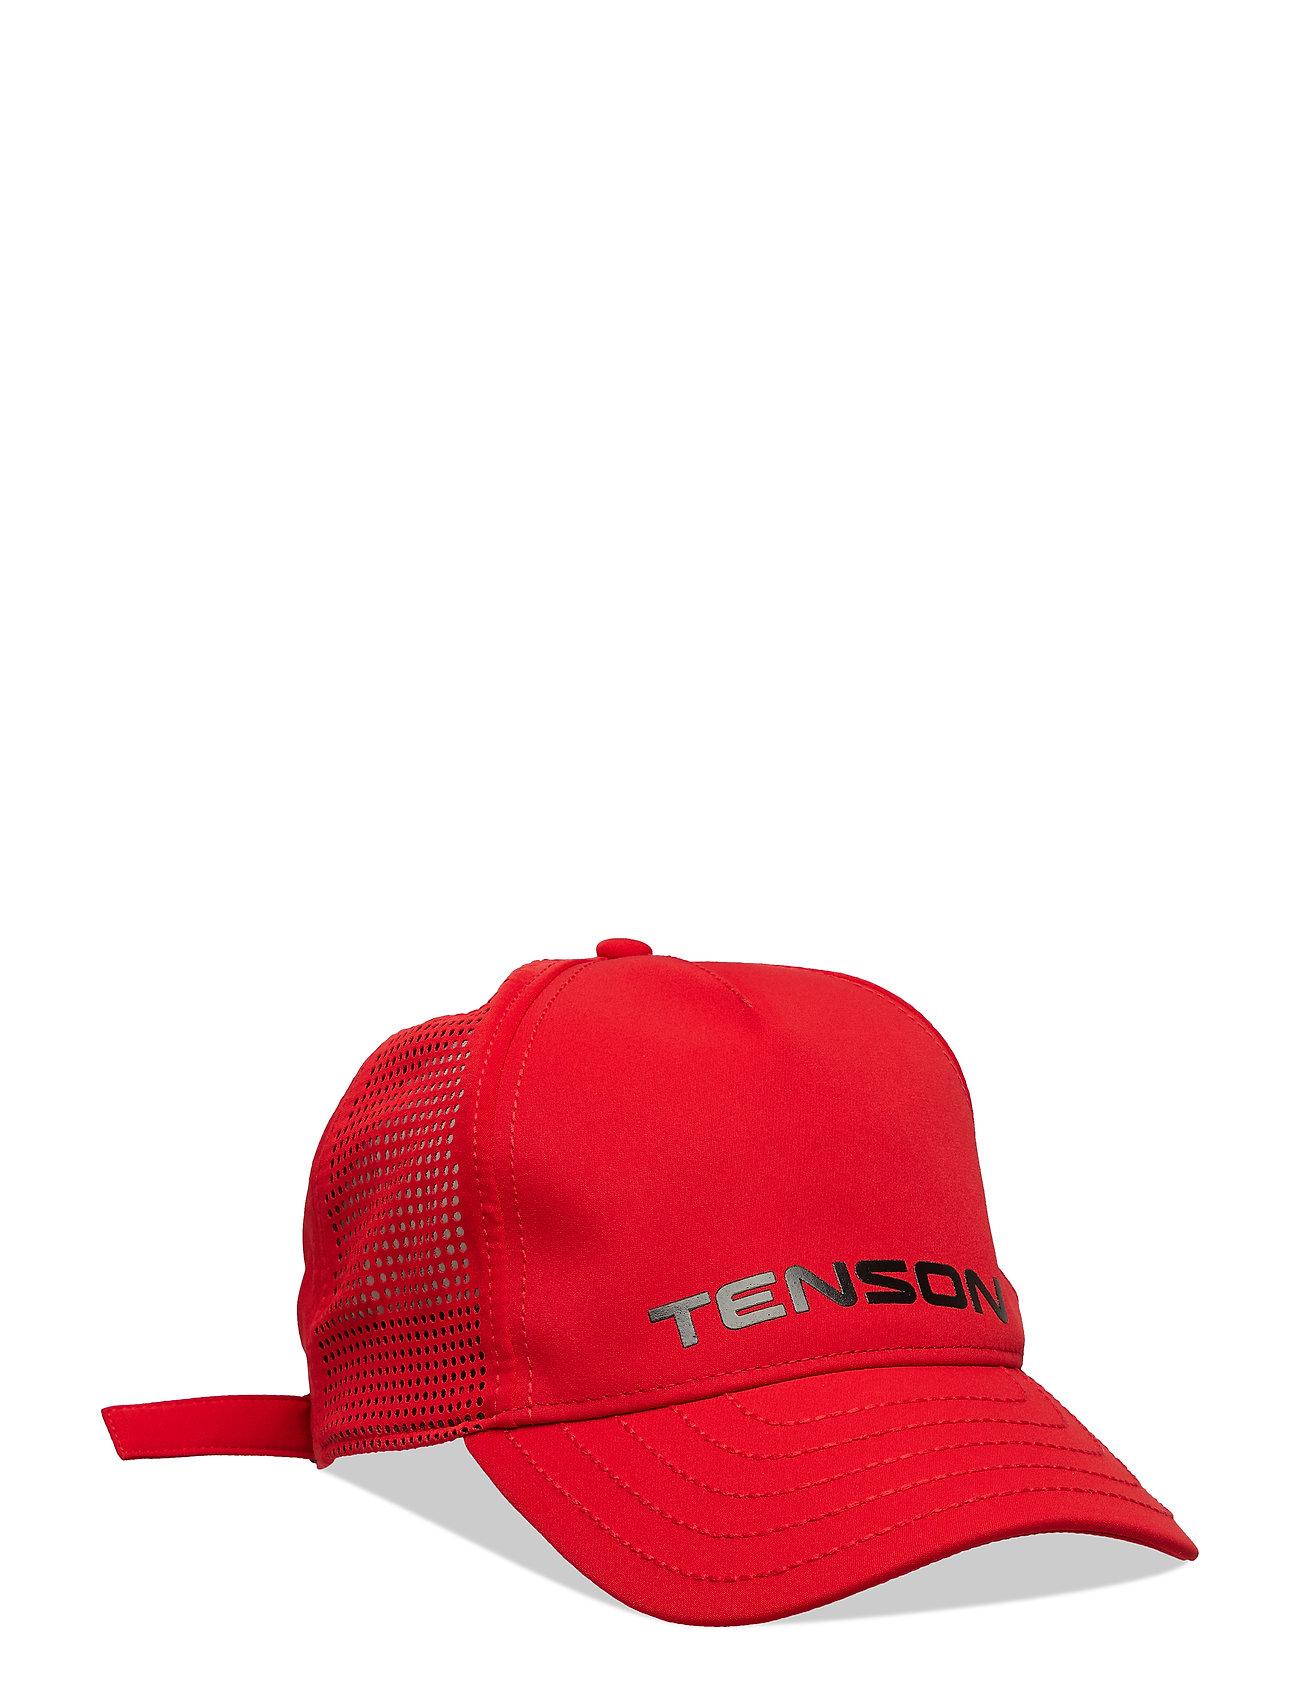 Image of Drive Accessories Headwear Caps Rød Tenson (3158644909)